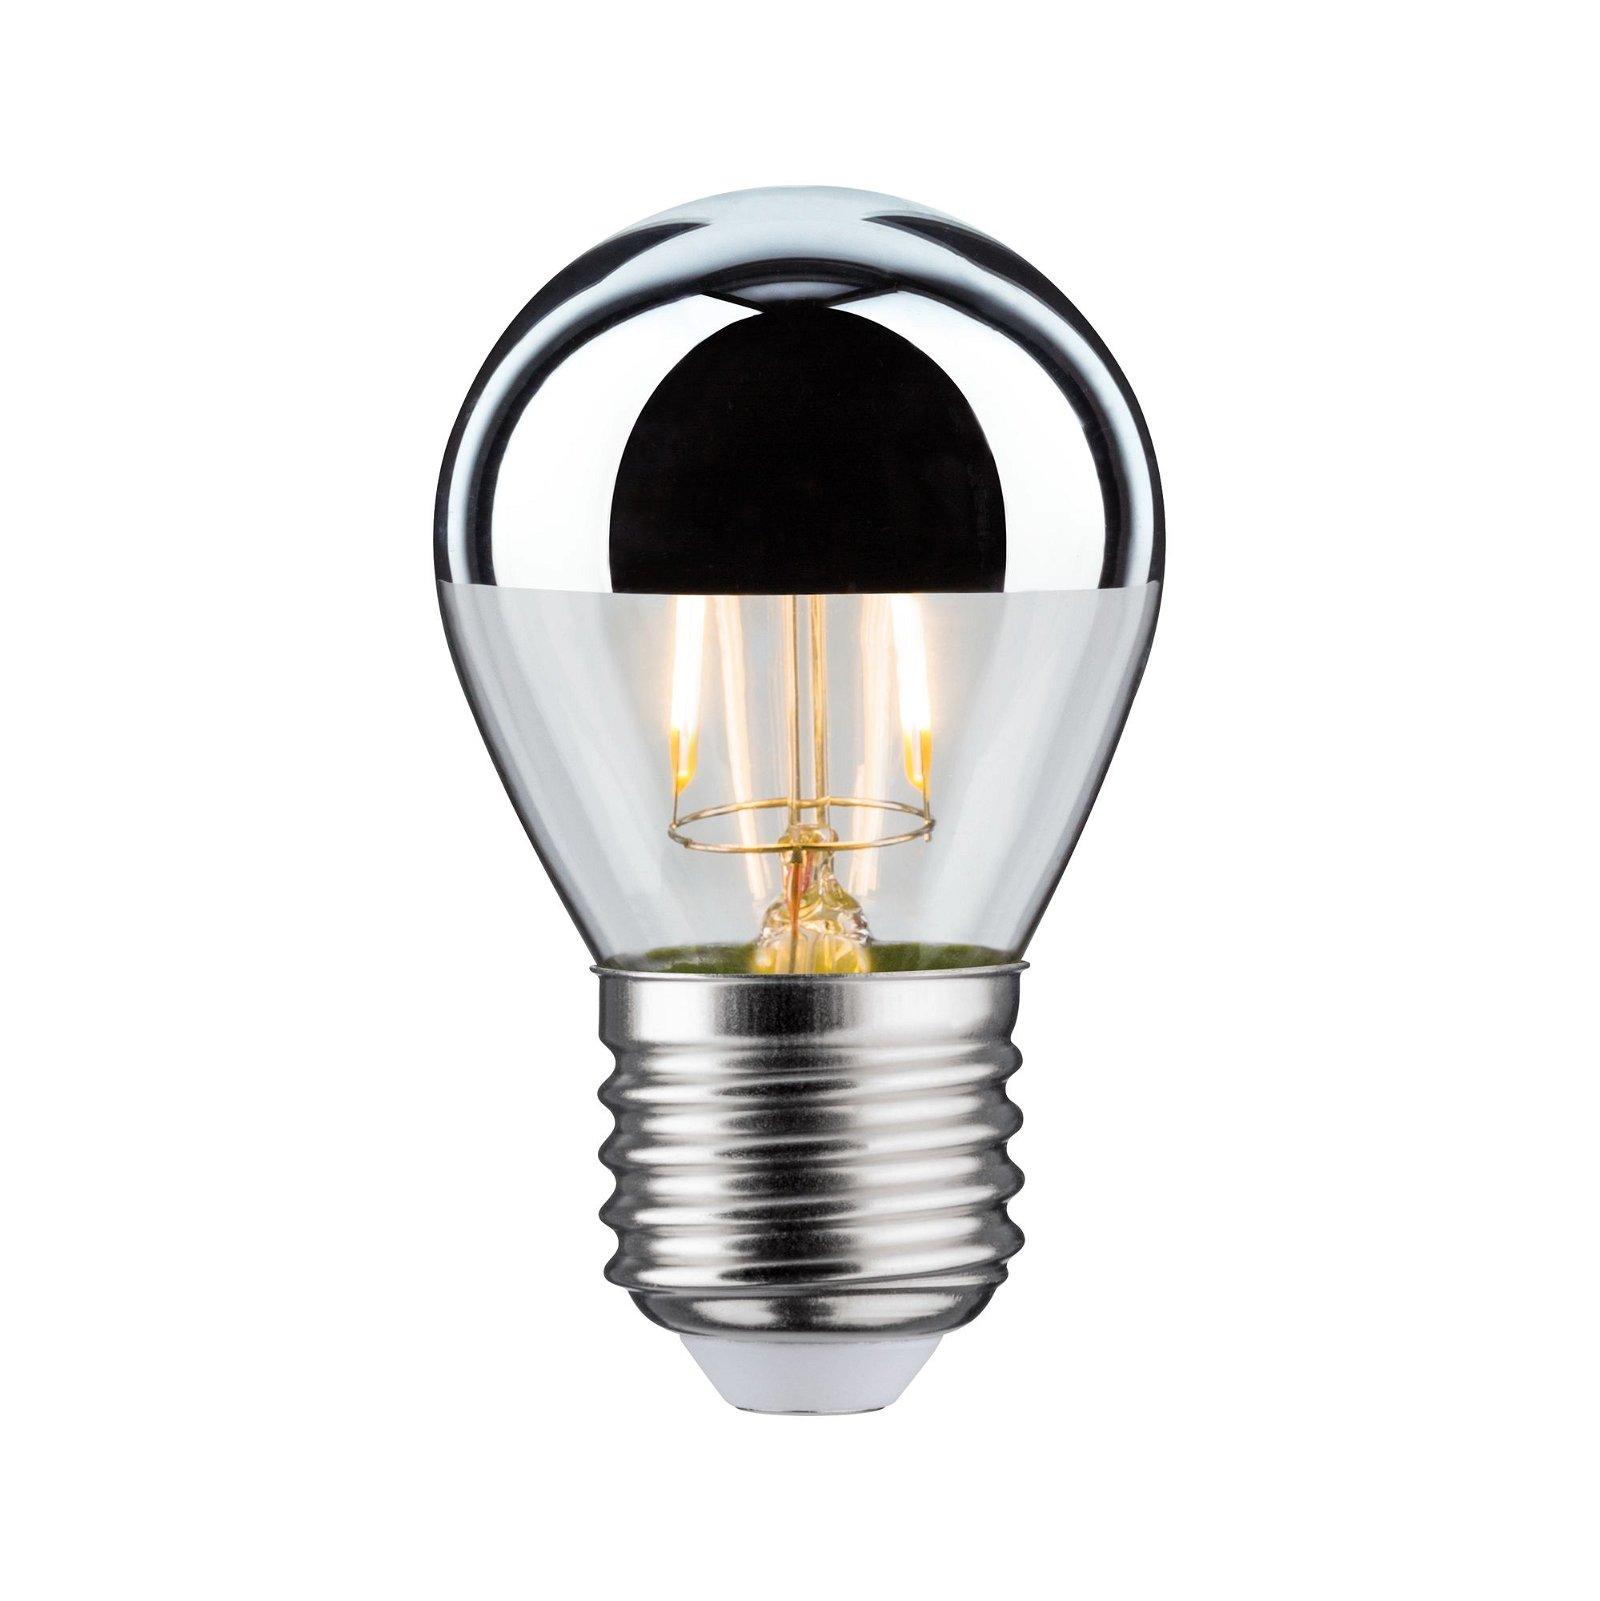 Modern Classic Edition LED Tropfen Kopfspiegel E27 230V 220lm 2,6W 2700K Kopfspiegel Silber